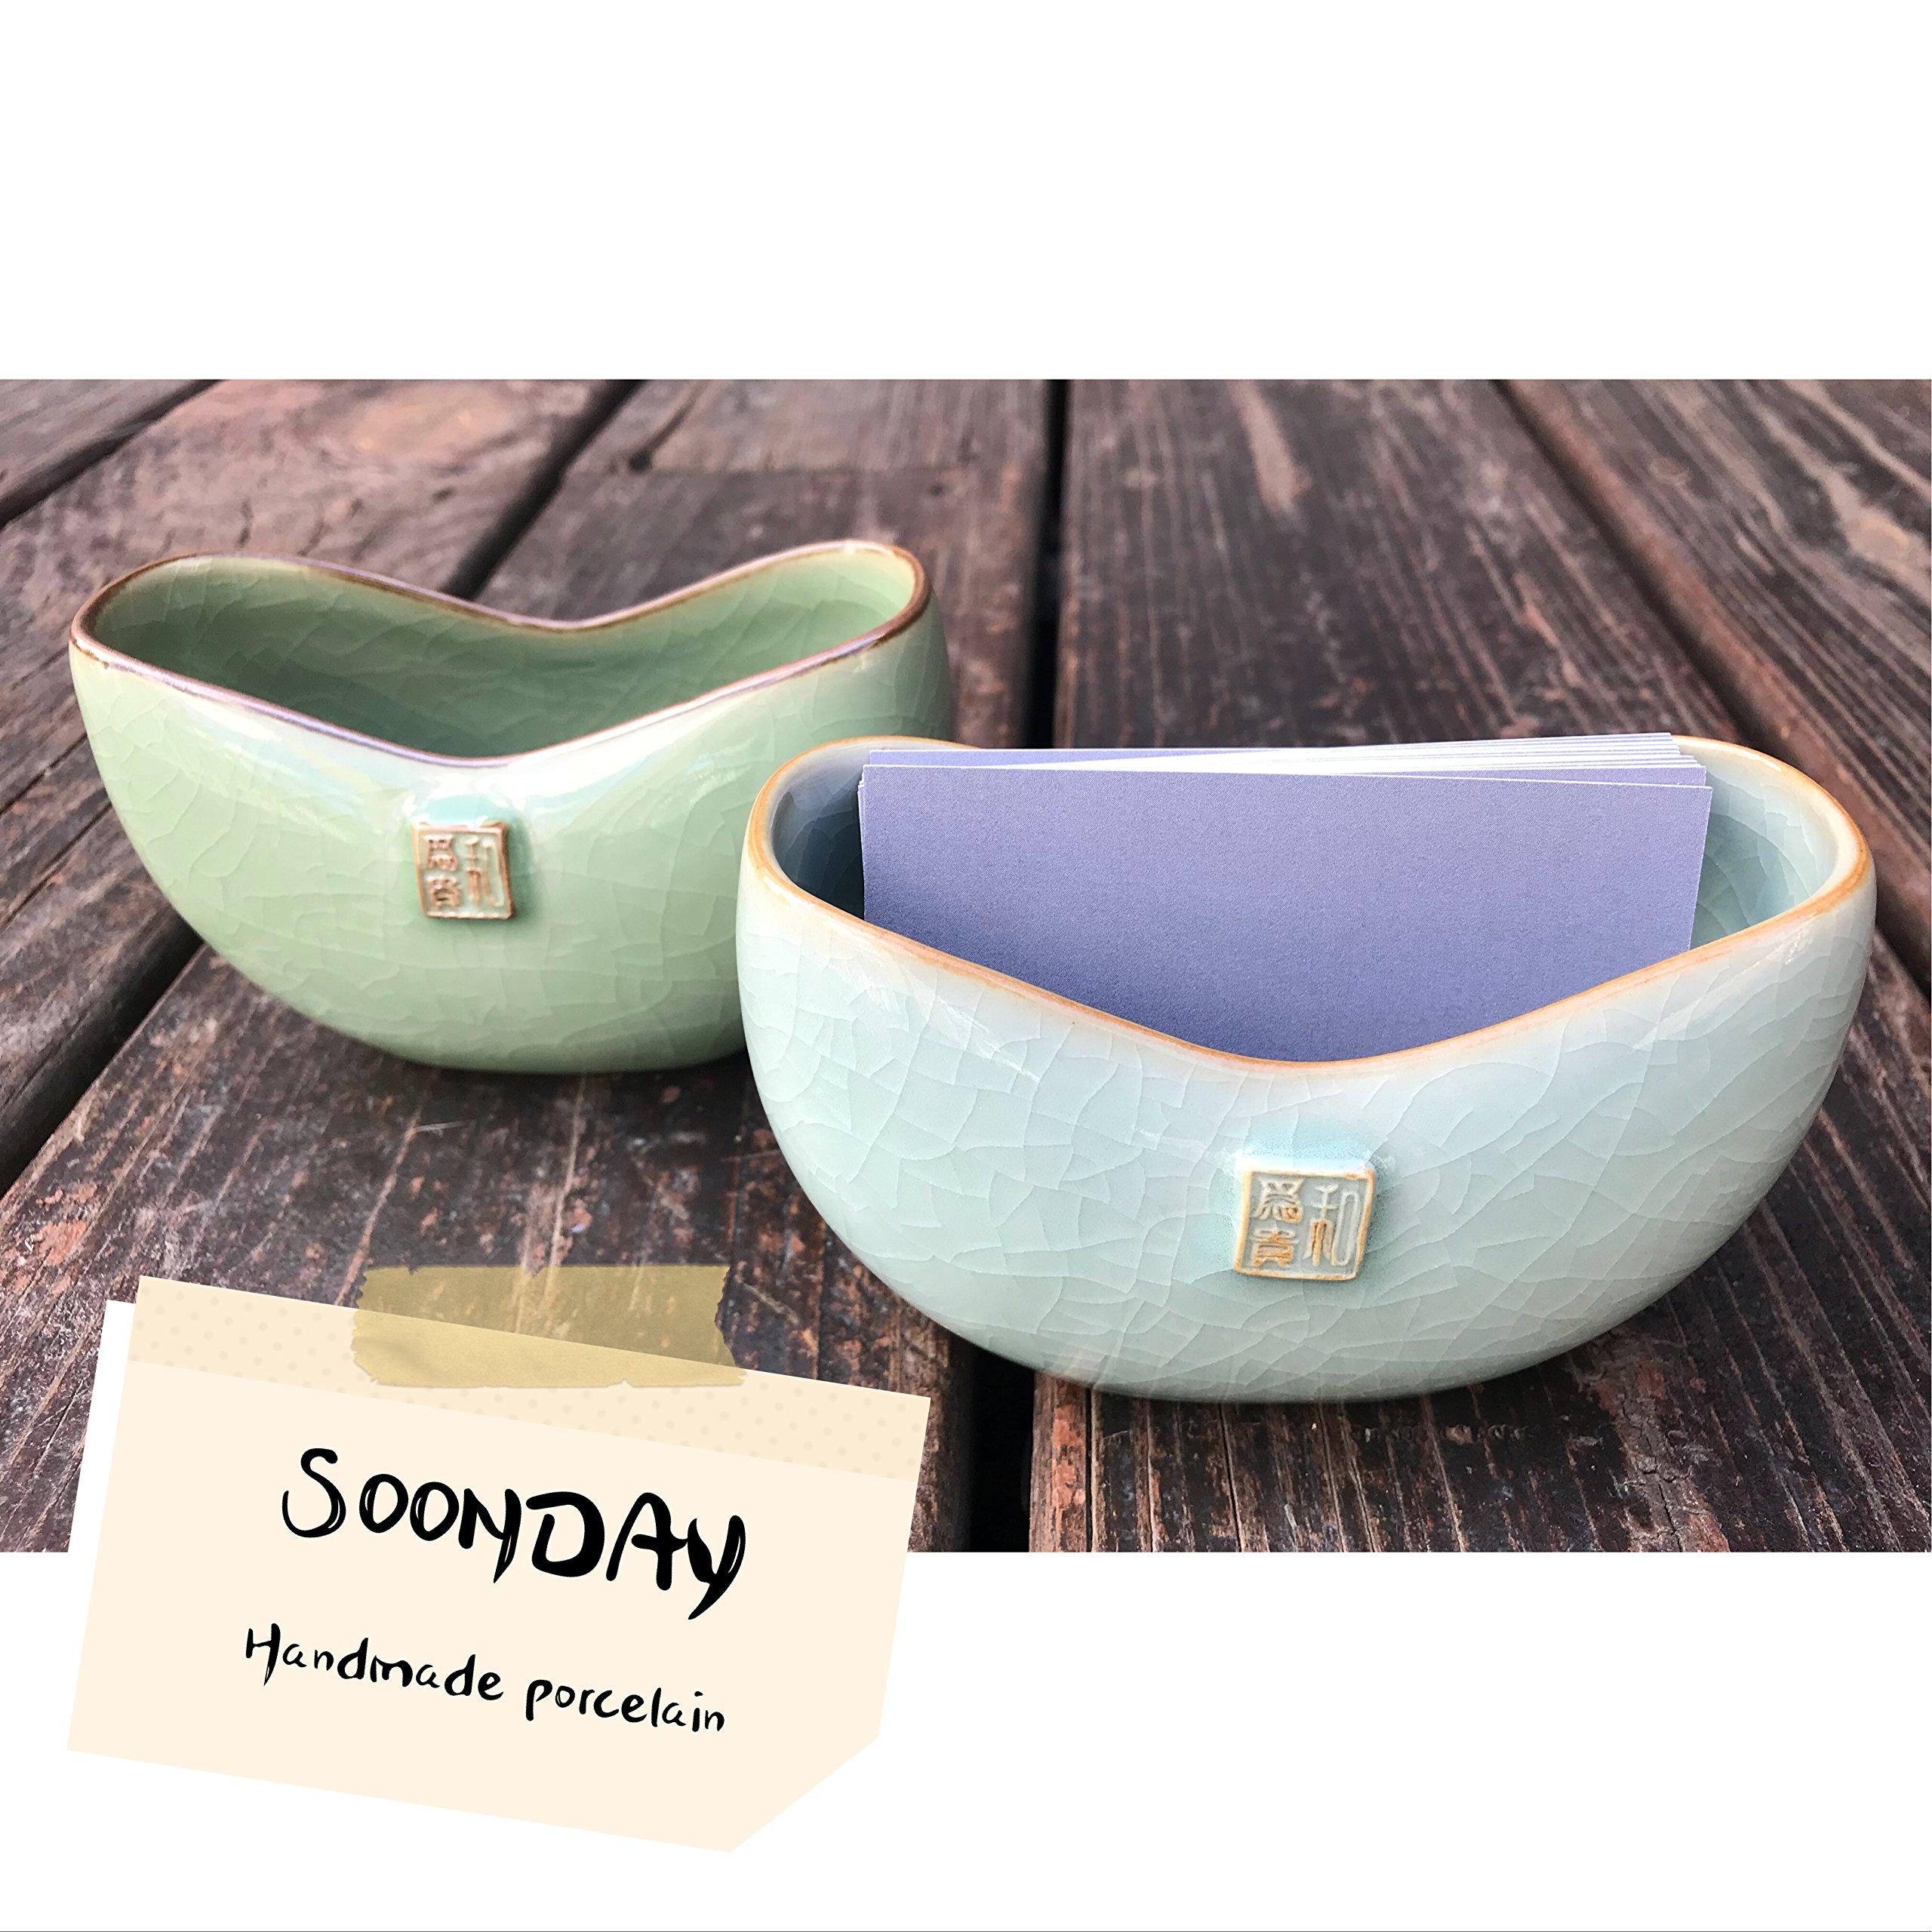 Desktop Business Card Holder | Ceramic Indoor Planter, Handmade Porcelain Container, Countertop Office Restaurant Home Decor 1 pc(Greenish Blue)